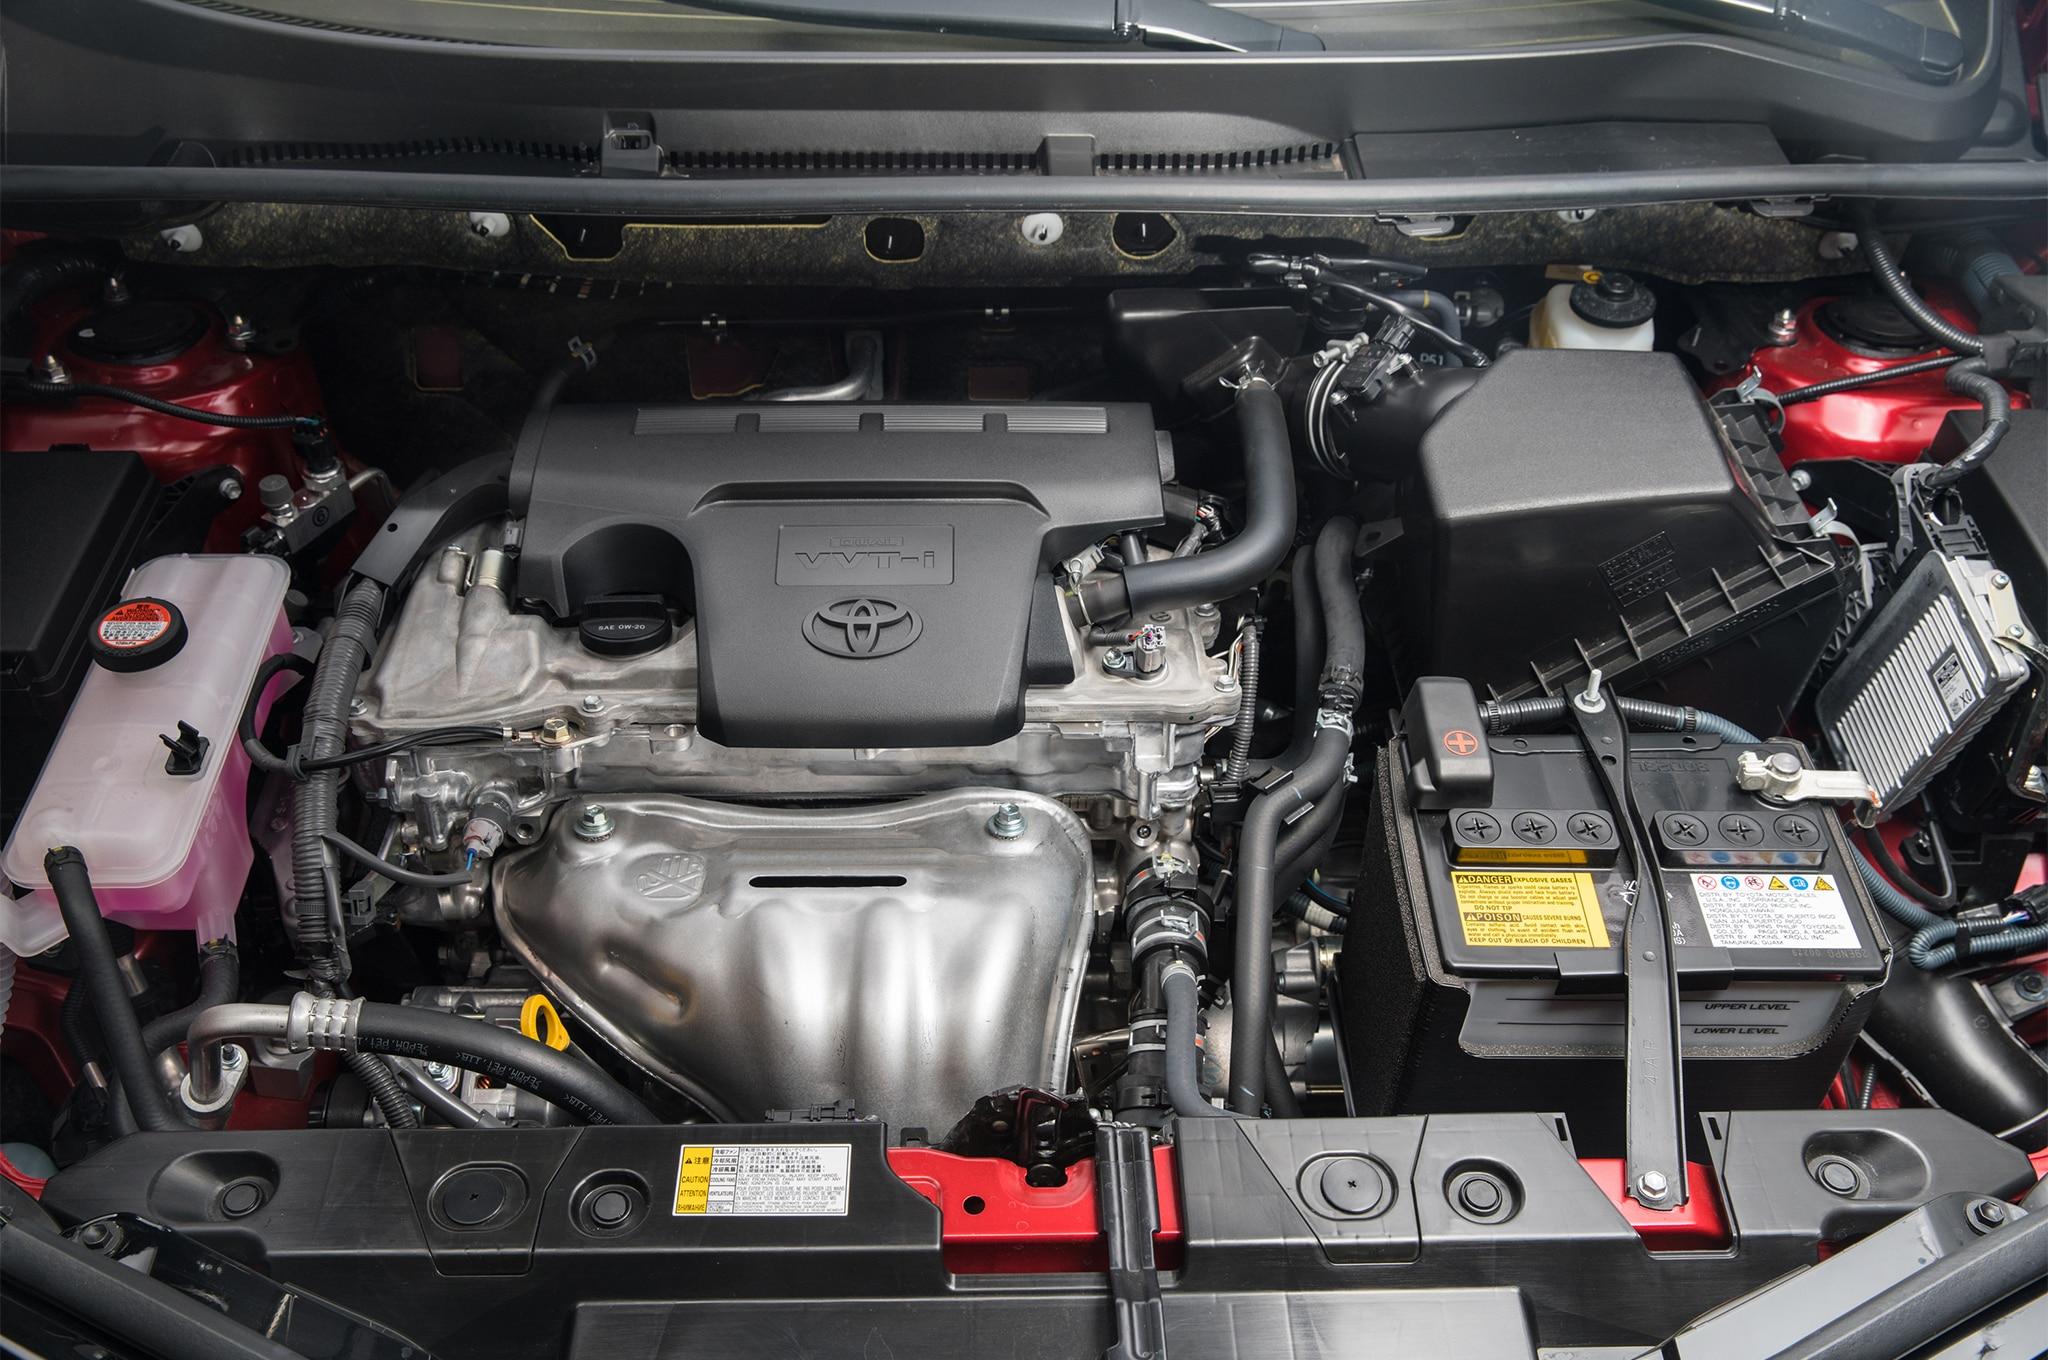 2017 Toyota Rav4 Limited Engine 01 14 Agosto Miguel Cortina